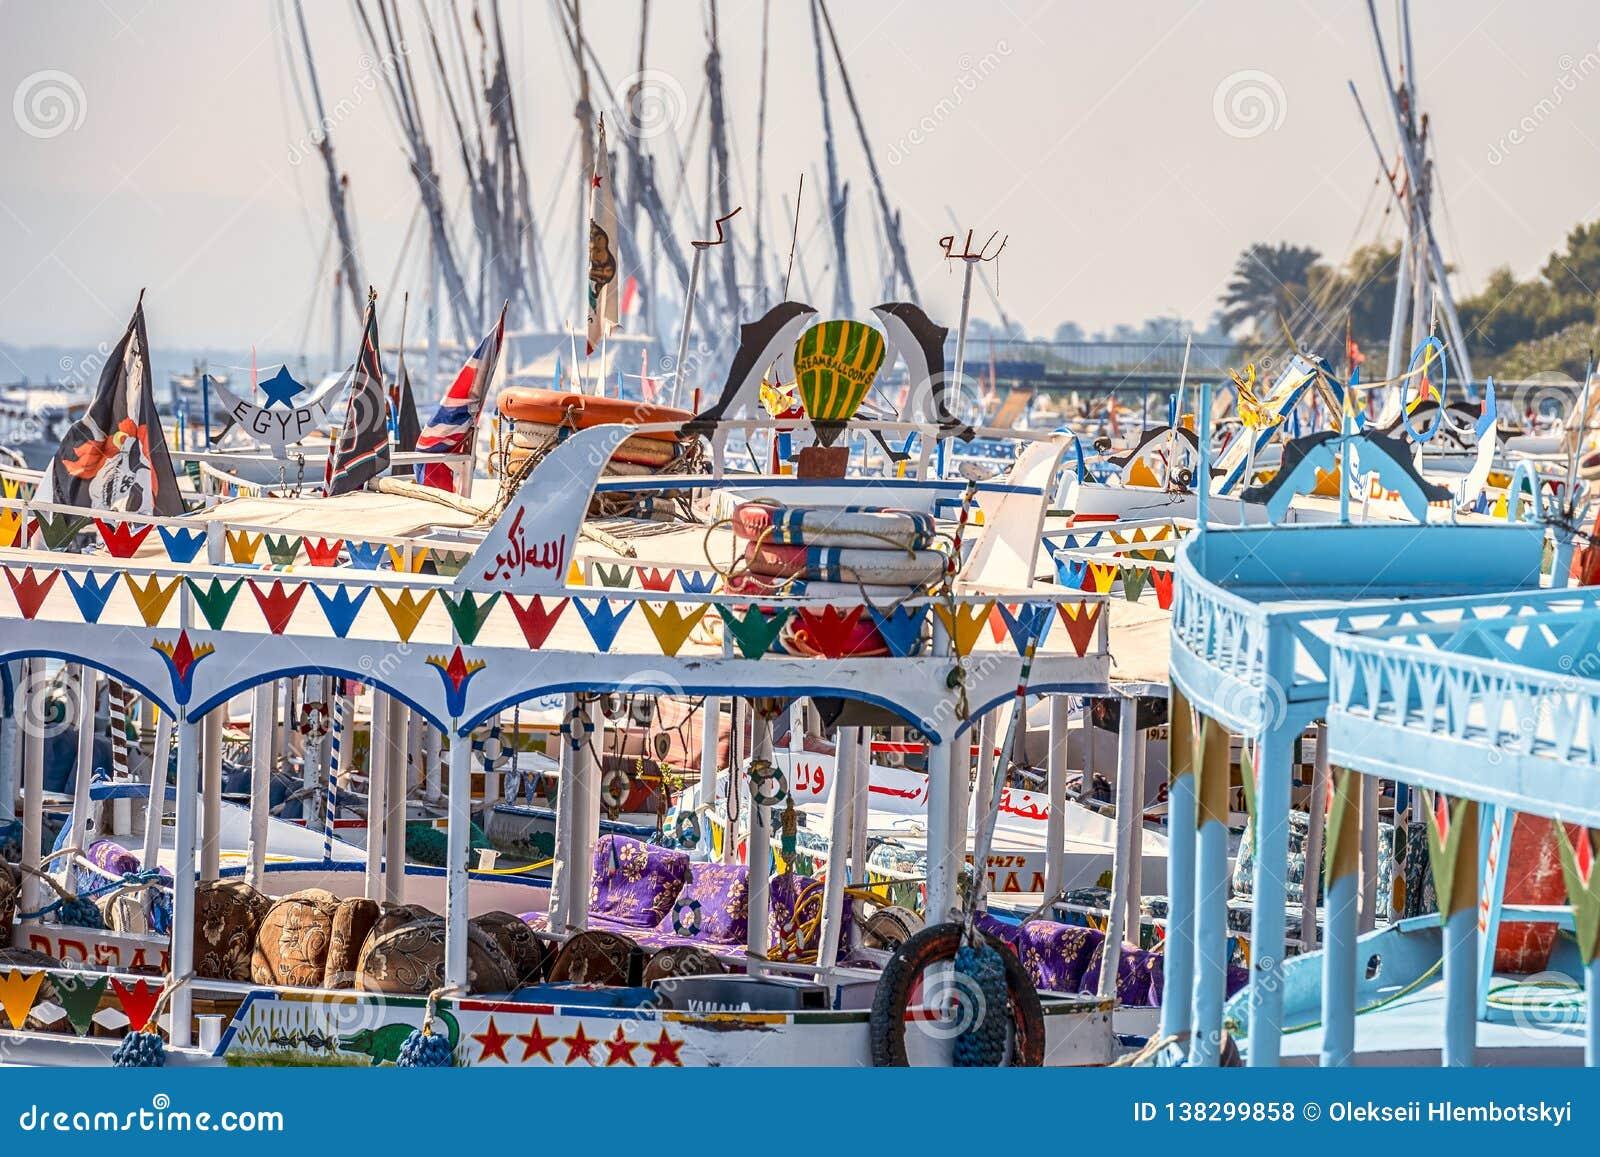 12 11 2018 Aswan, Αίγυπτος, ζωηρόχρωμο χρωματισμένο felucca βαρκών στο μηδέν ποταμών